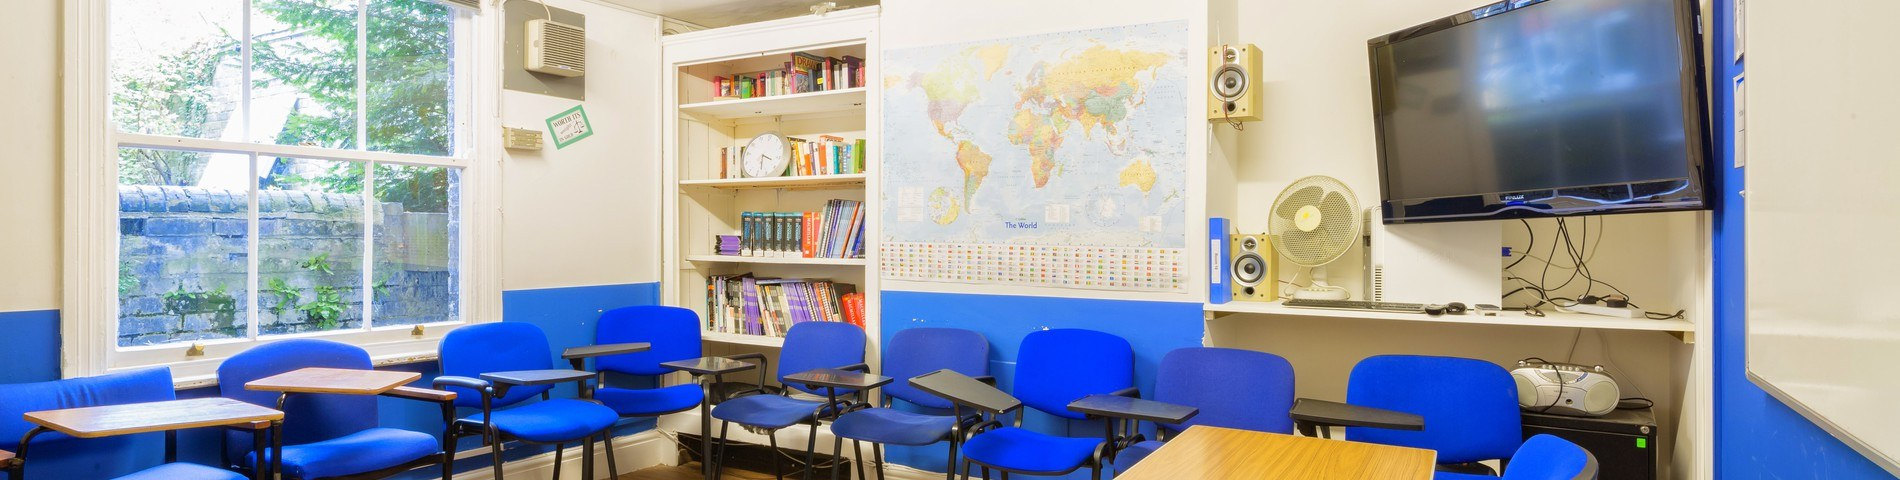 LSI - Language Studies International billede 1